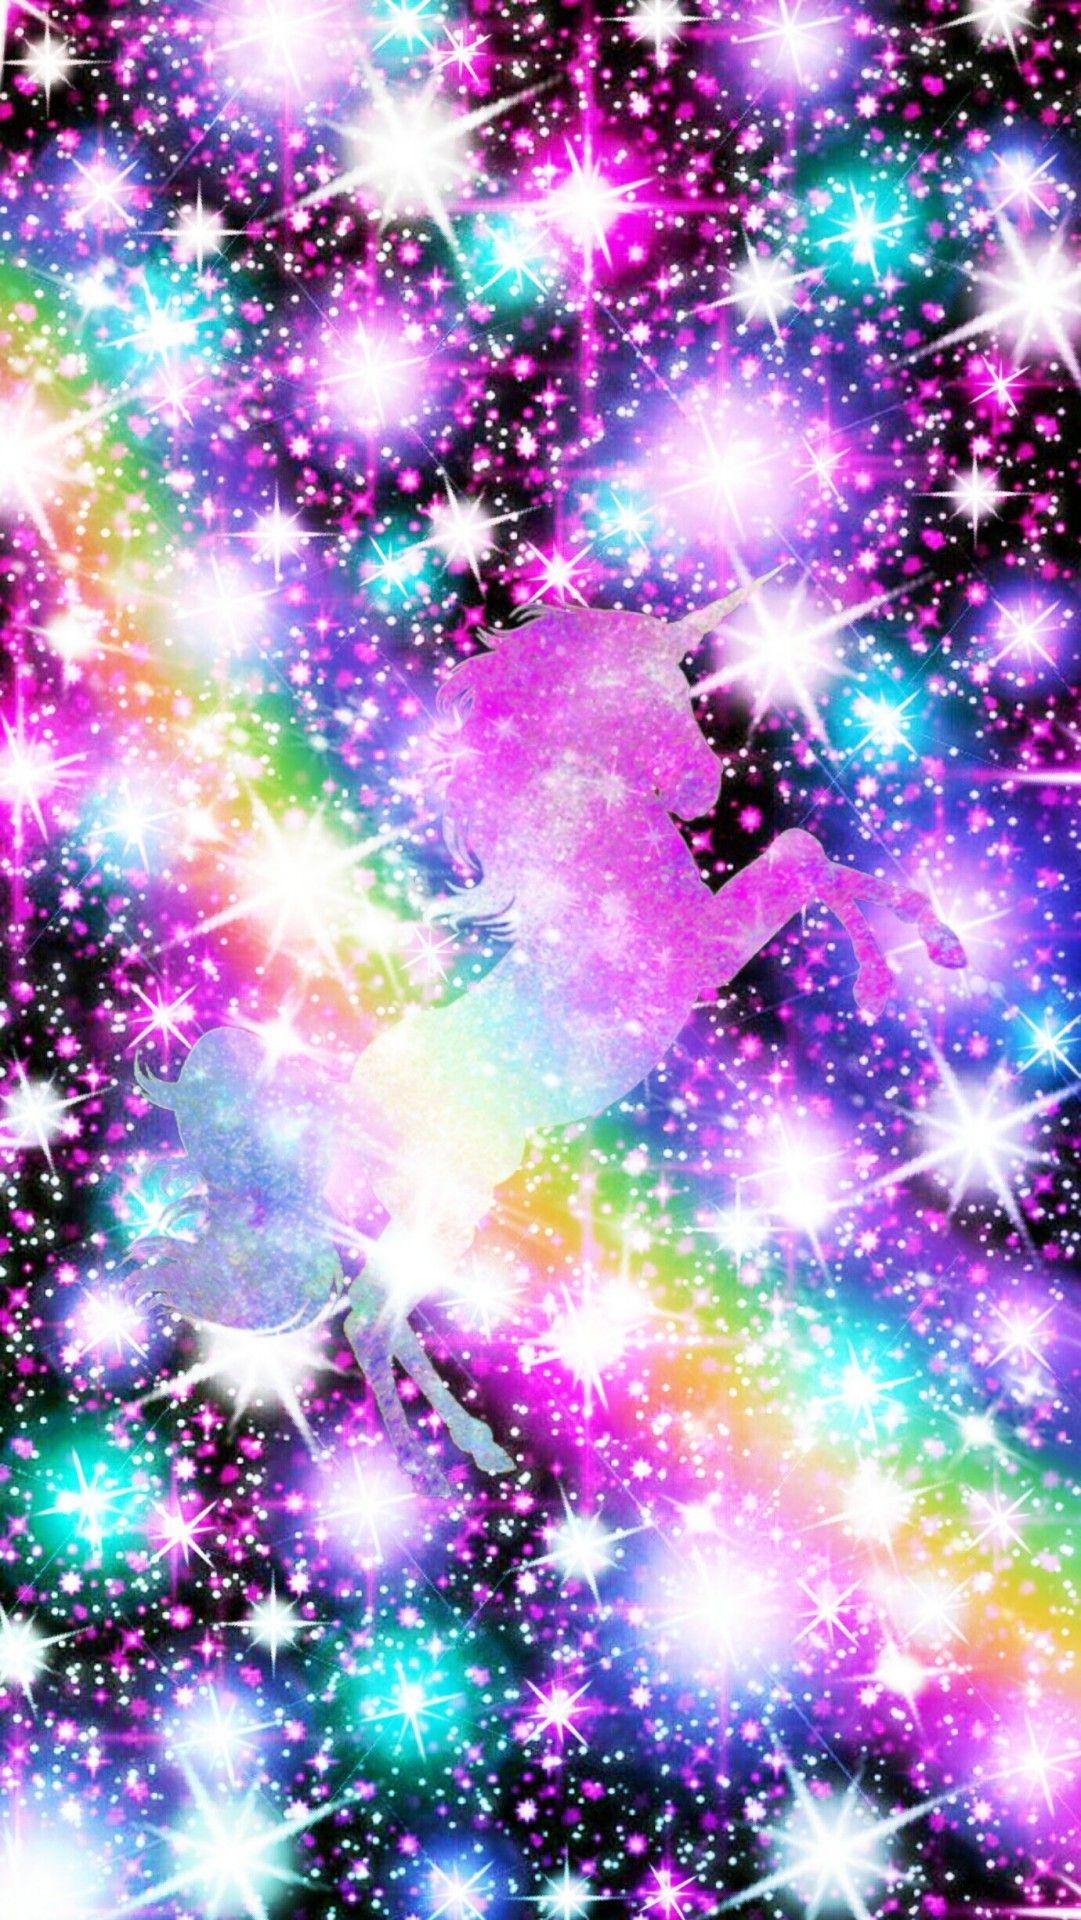 Galaxy Rainbow Glitter Wallpaper : galaxy, rainbow, glitter, wallpaper, Galaxy, Pastel, Glitter, Rainbow, Unicorn, Wallpaper